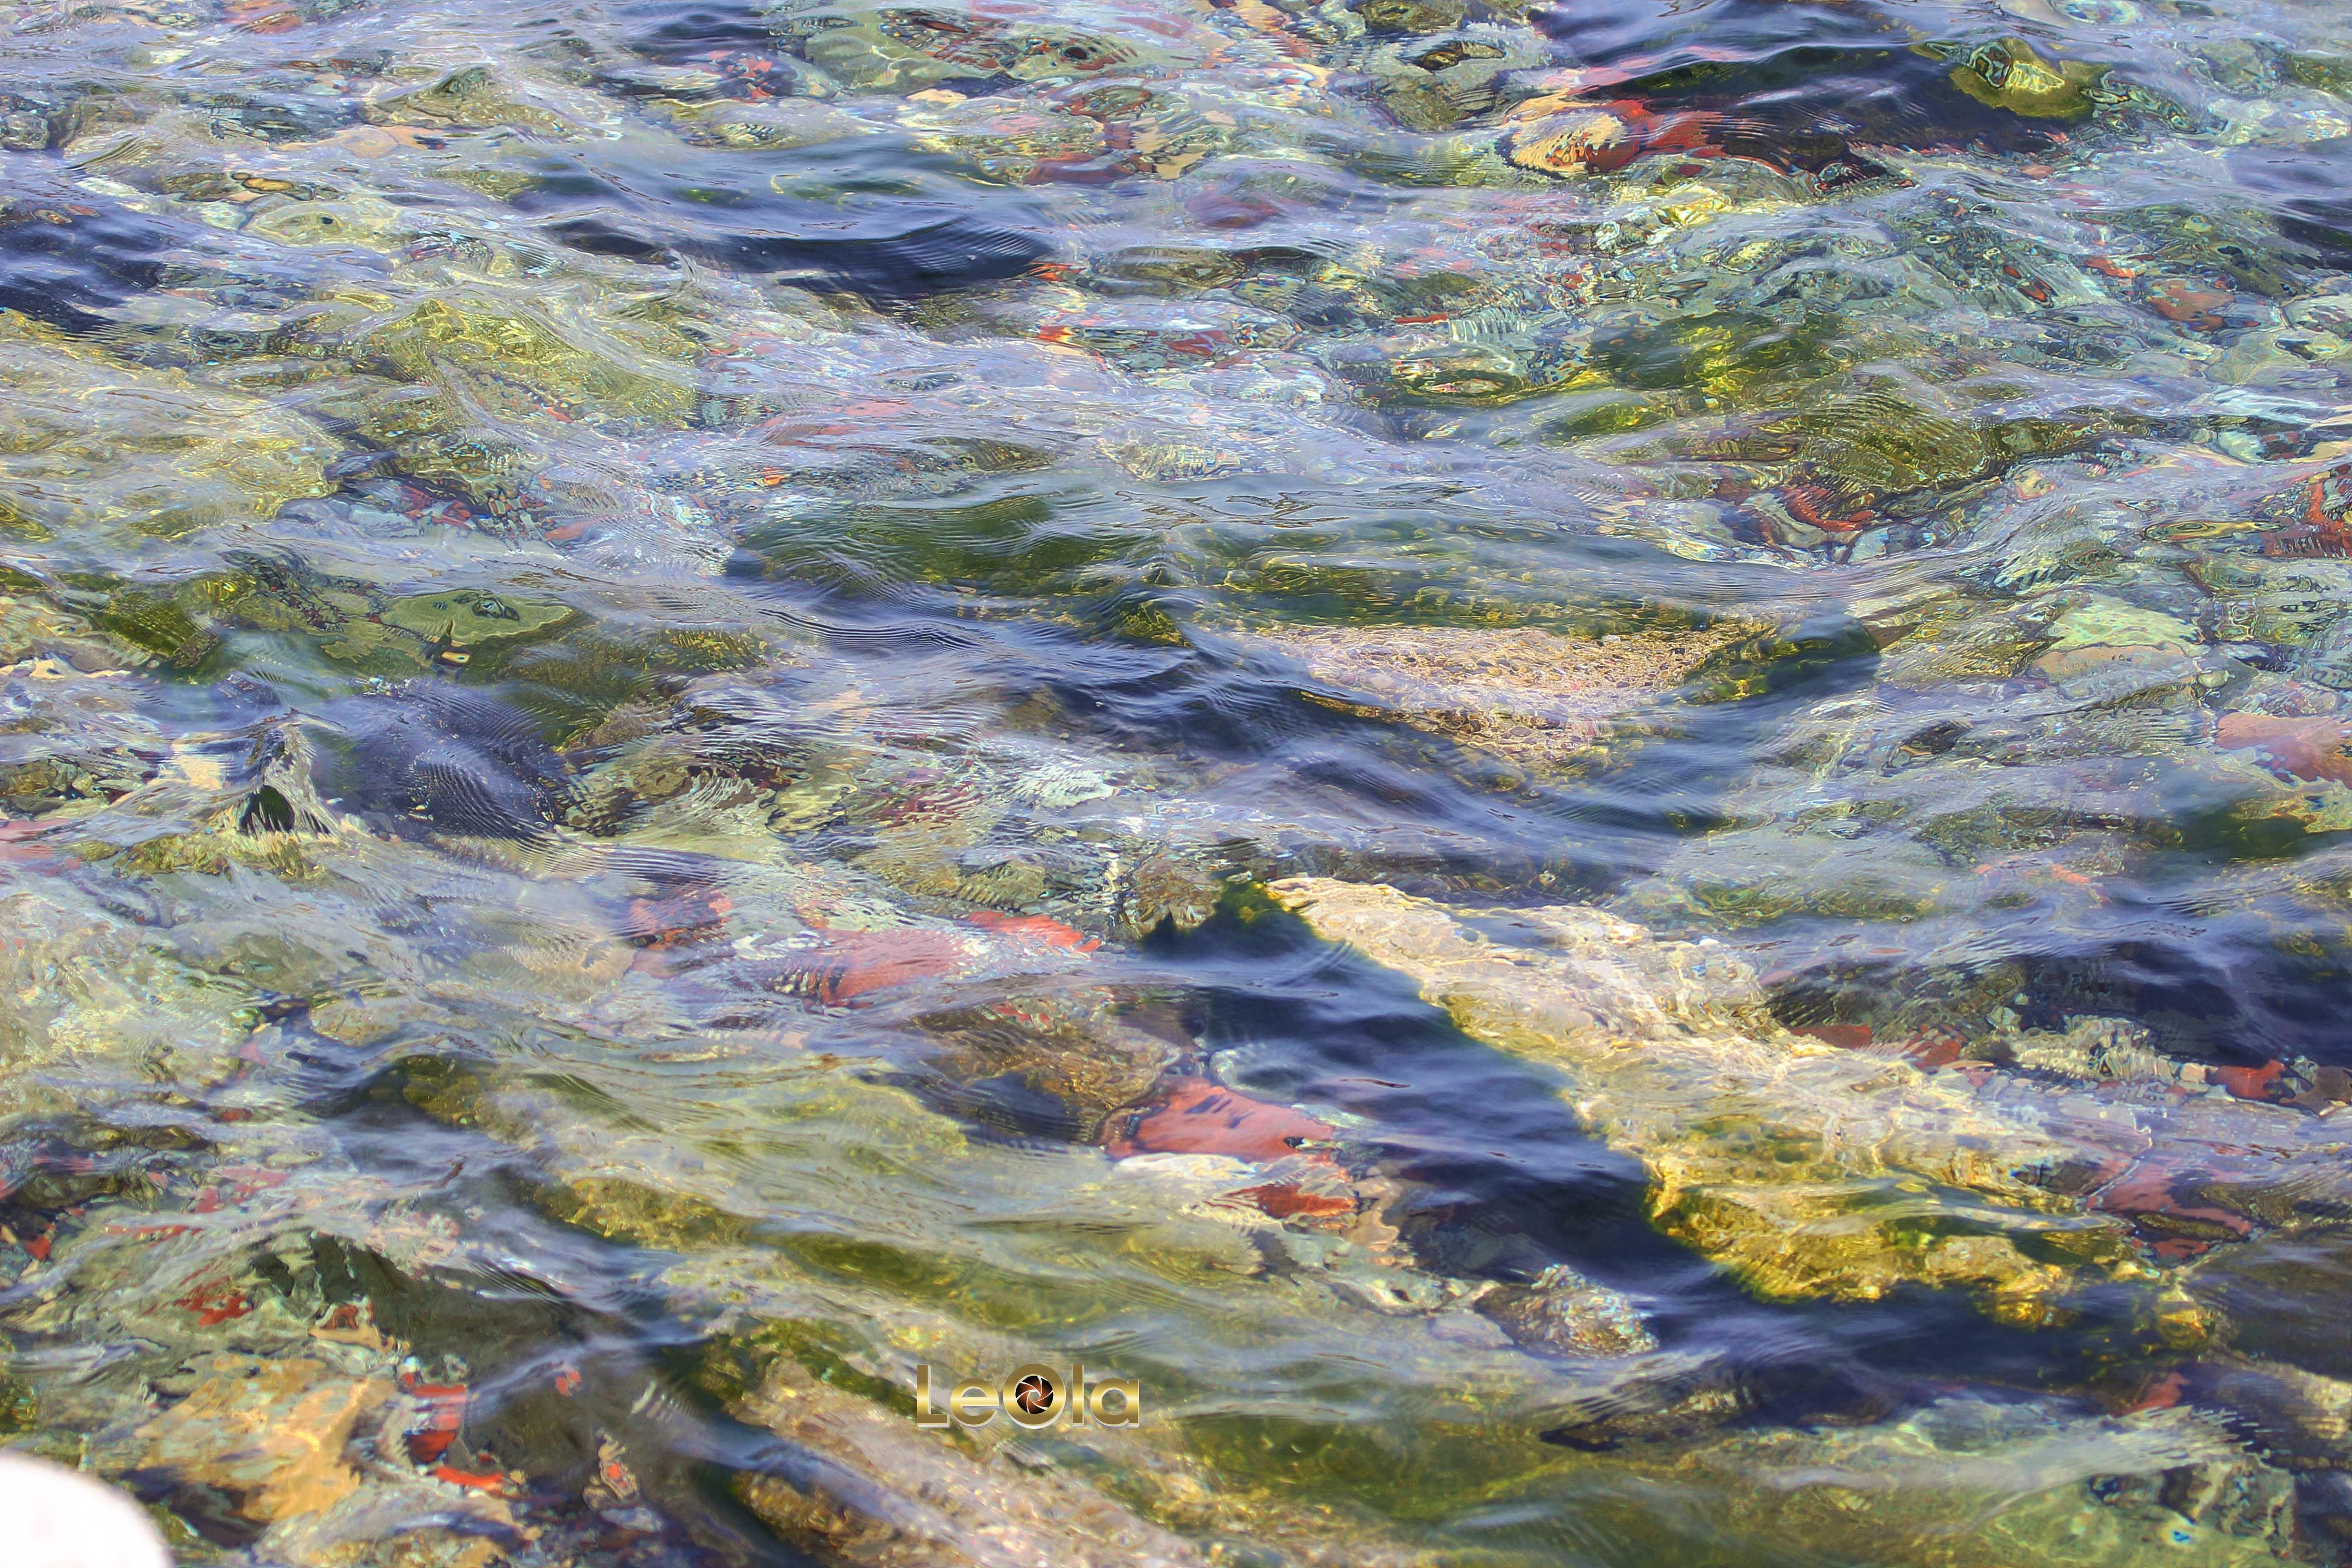 Photo Challenge:Water & River Rocks